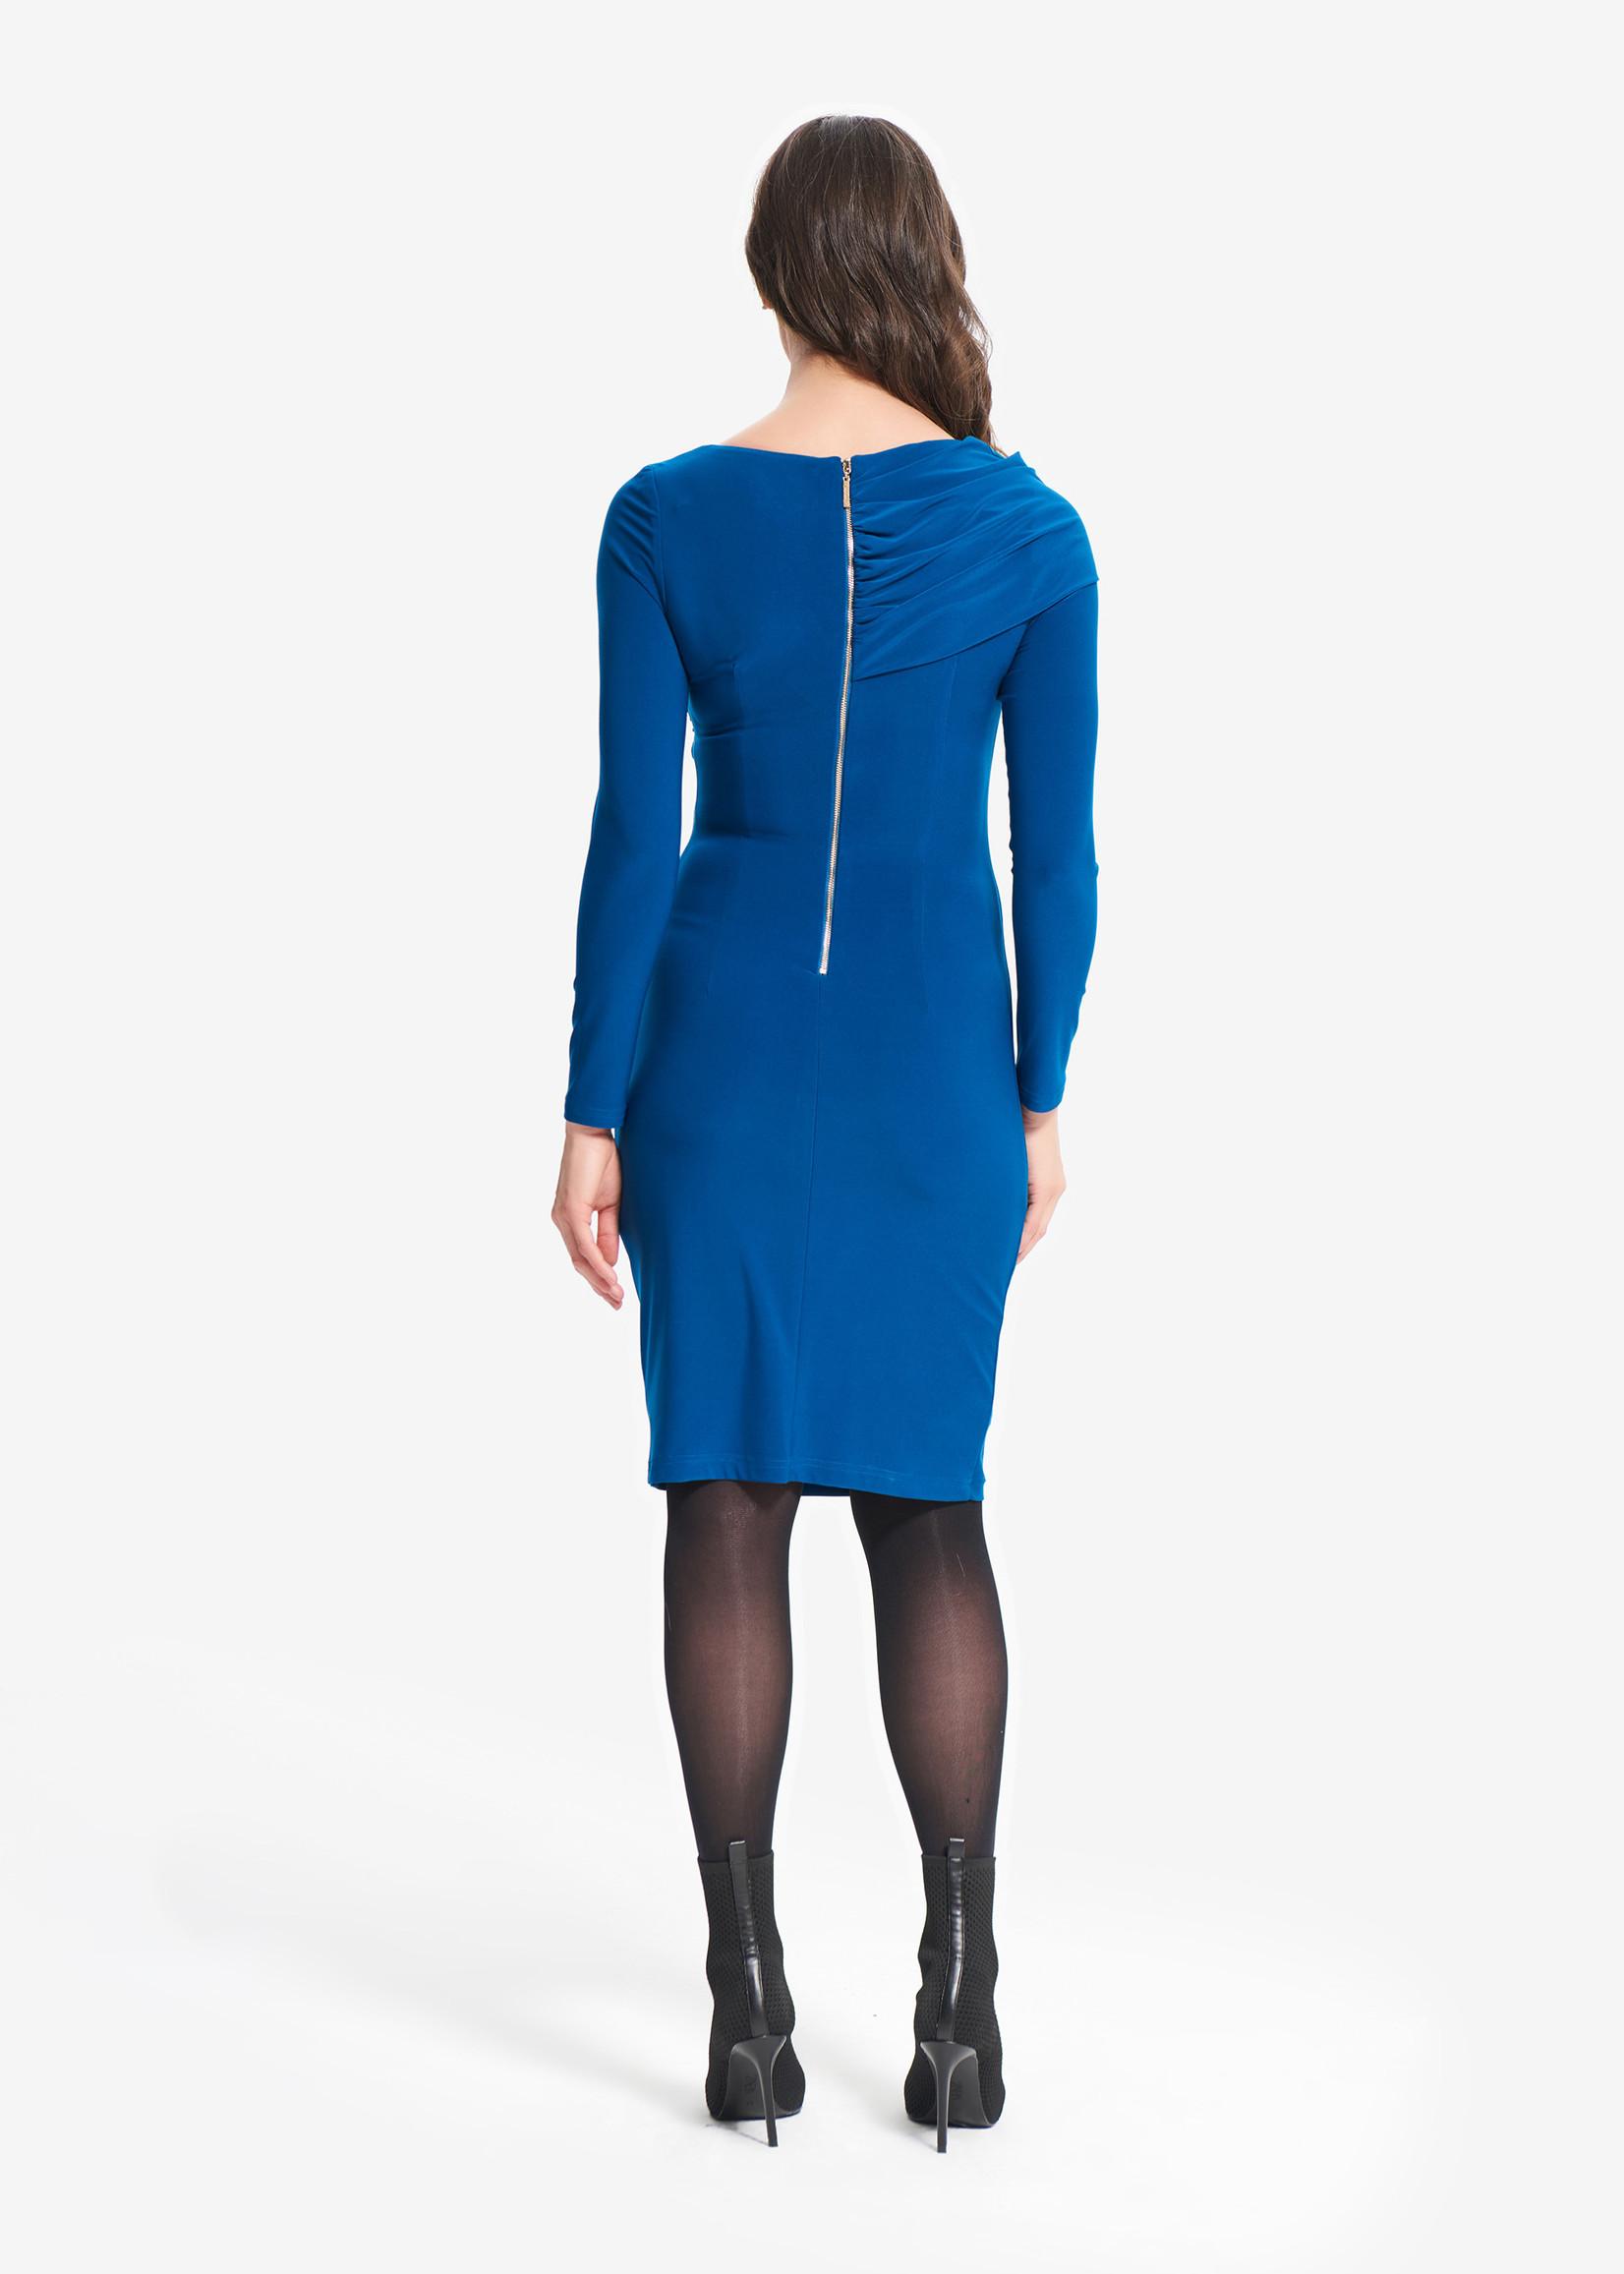 Joseph Ribkoff Dress with Side Ruching